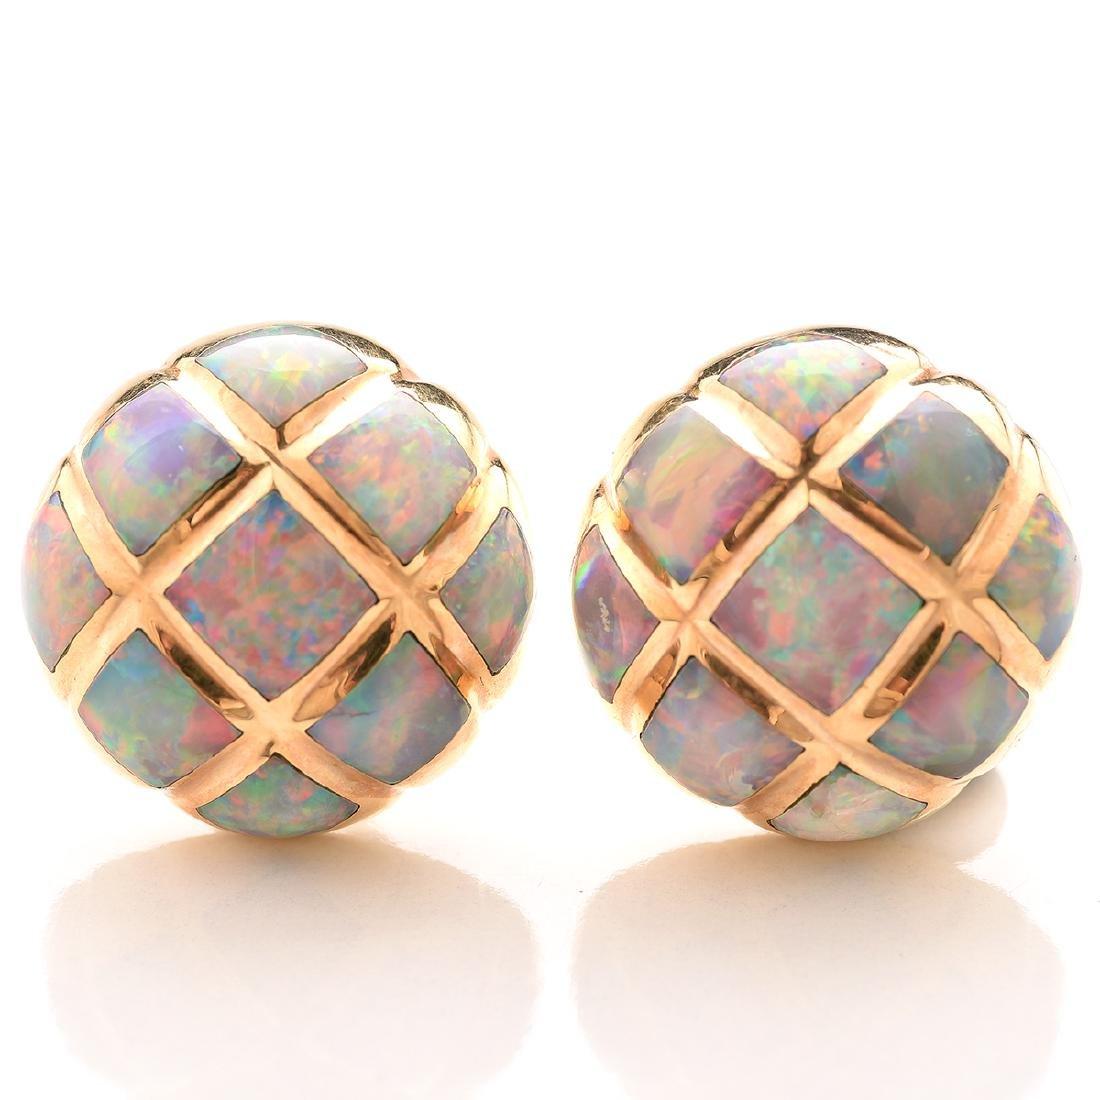 Pair of Kabana Opal, 14k Earrings.